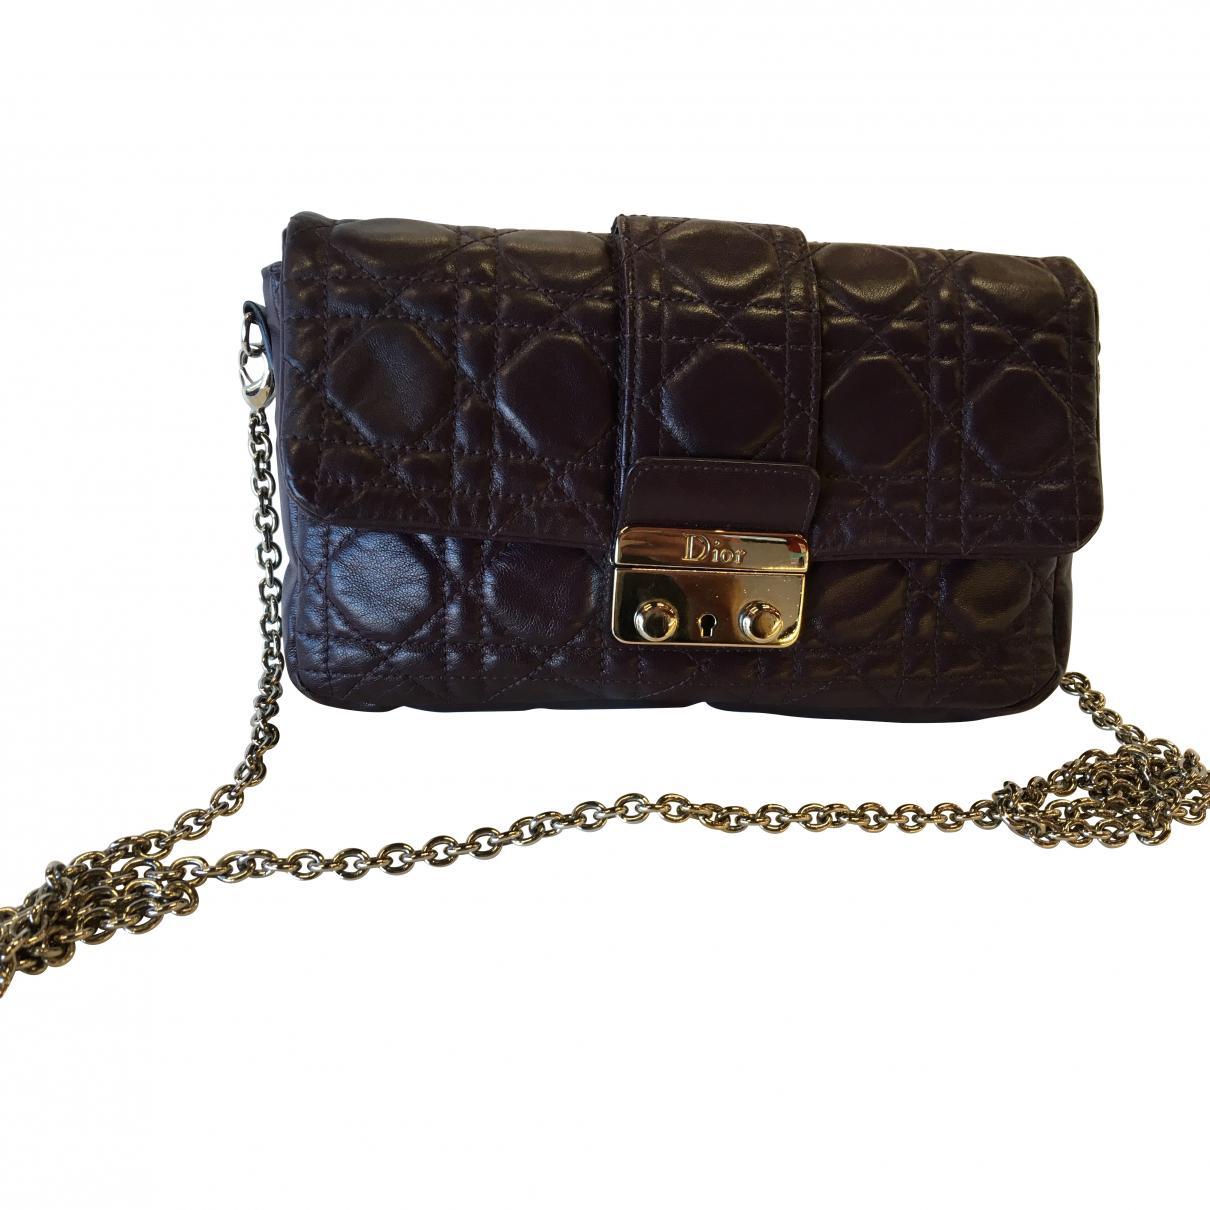 e9b789bd718e Dior Pre-owned Miss Purple Leather Clutch Bag in Purple - Lyst